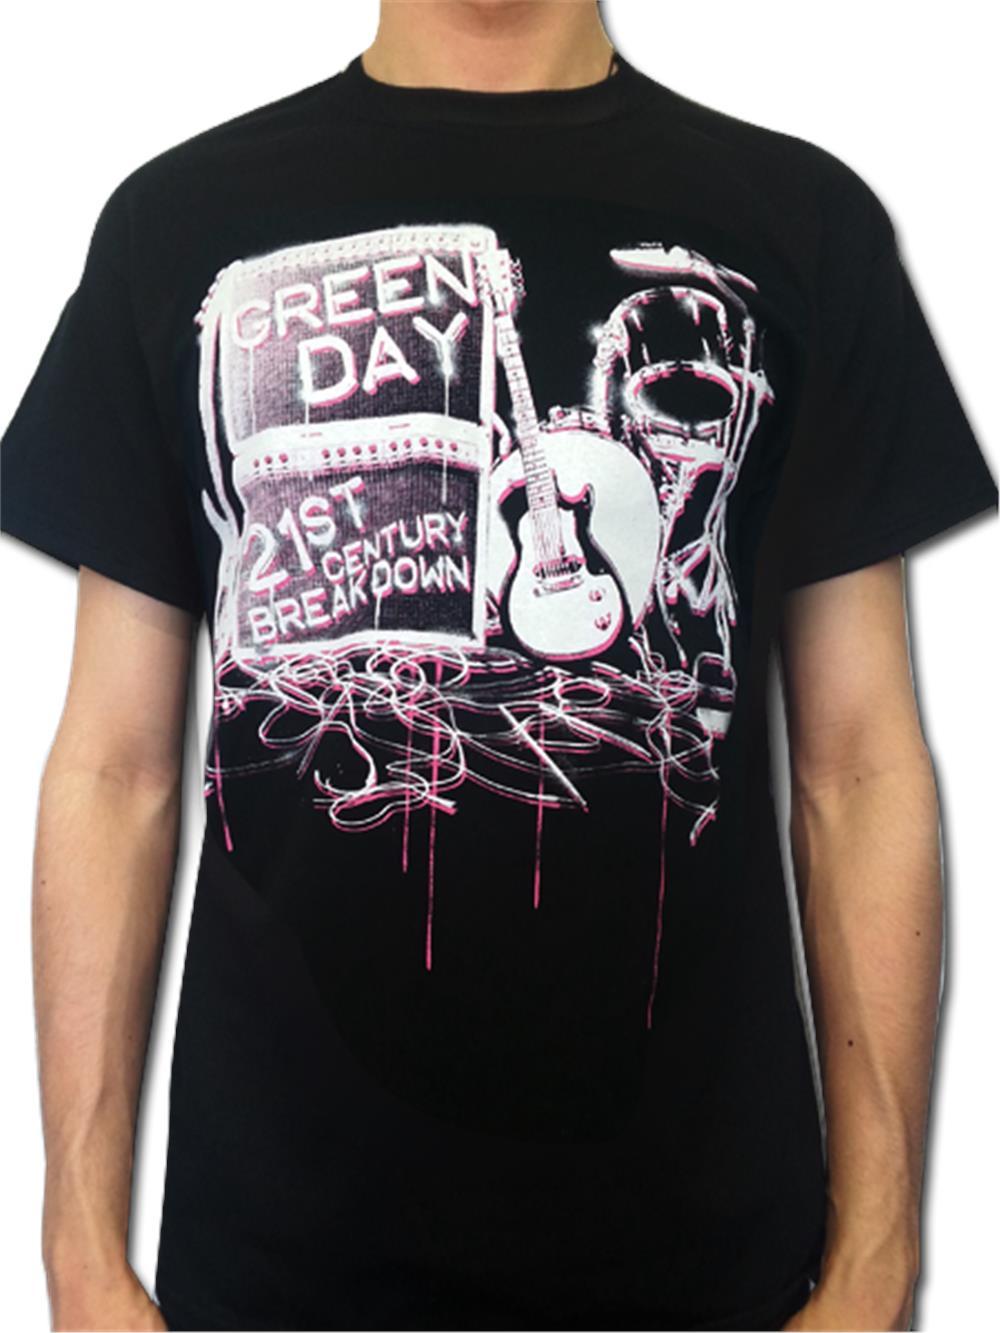 Sessions T-Shirt